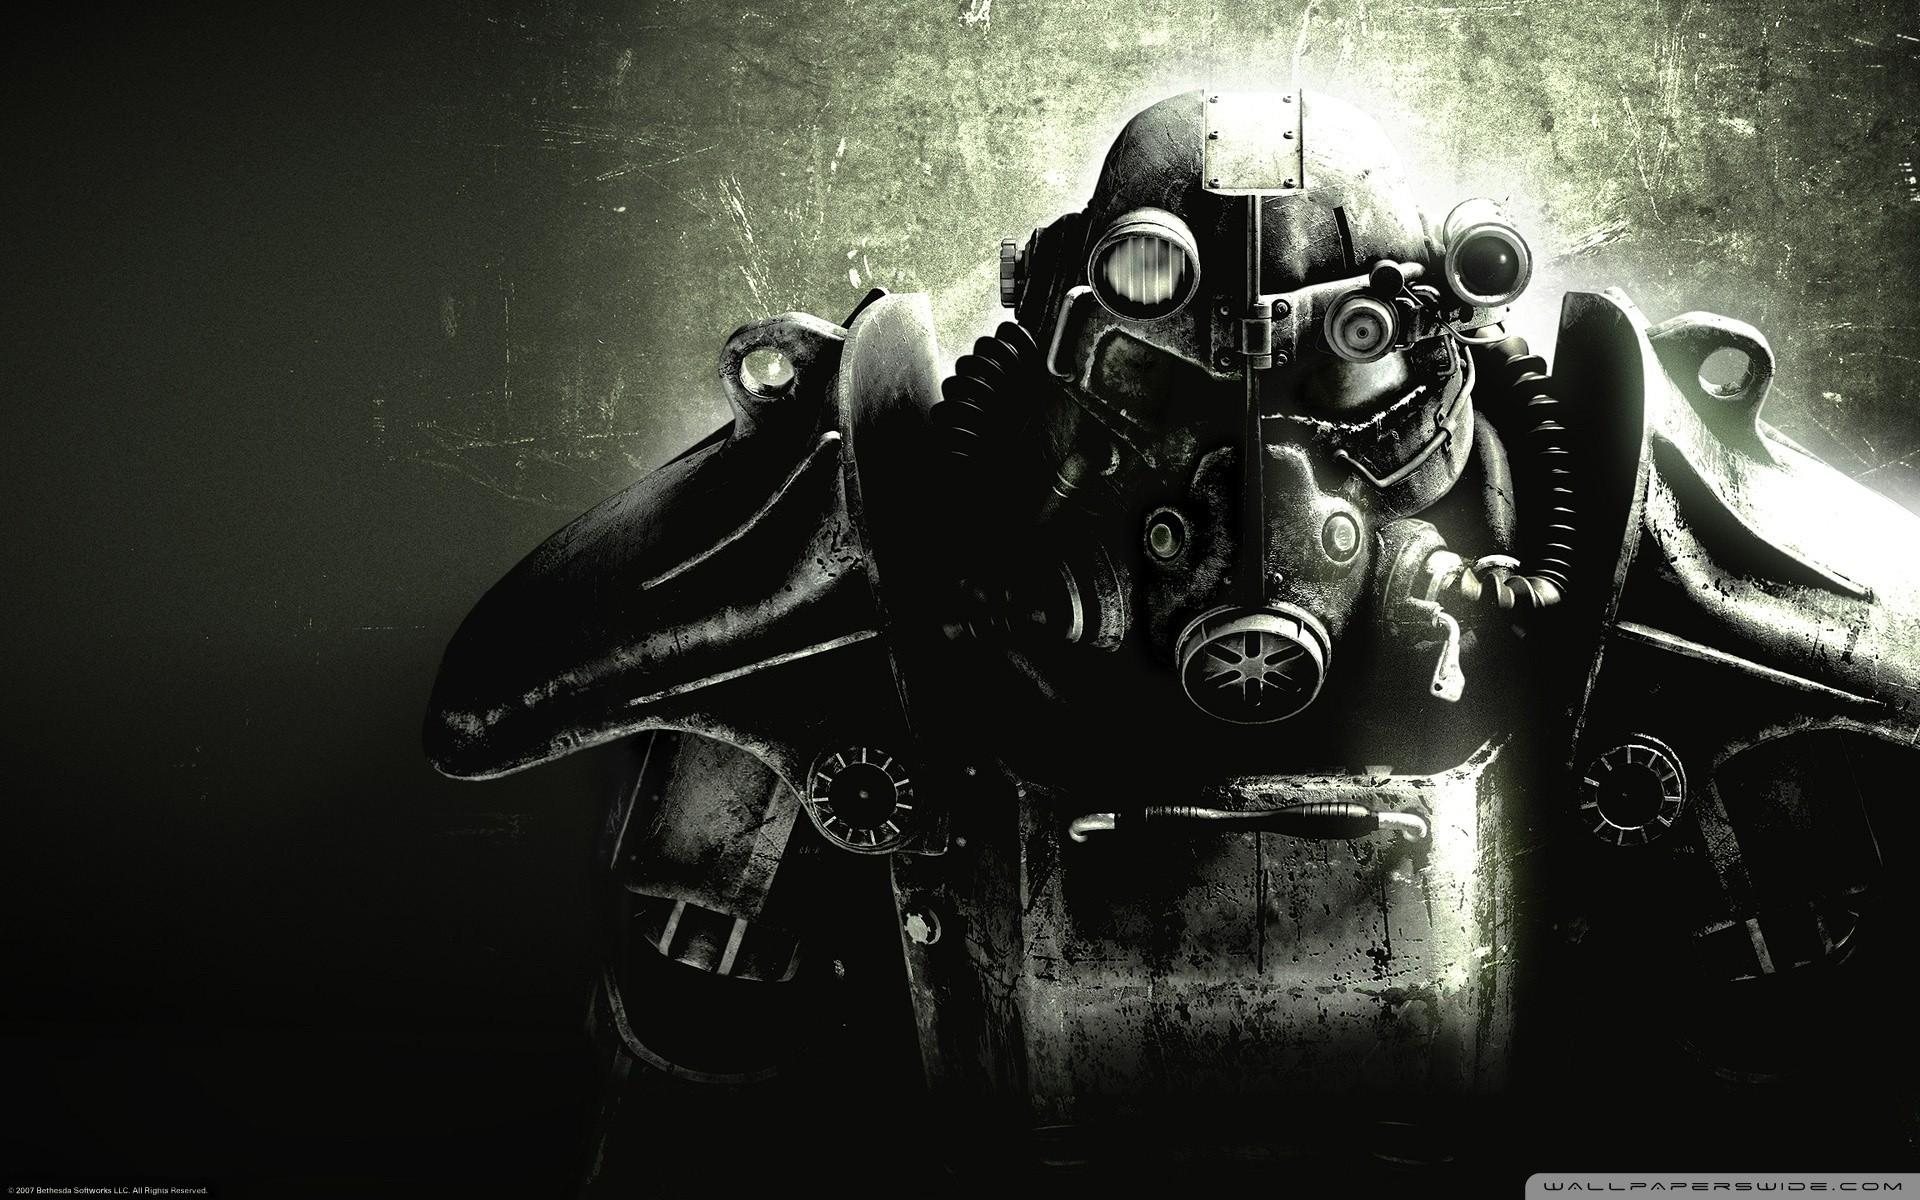 Fallout 3 HD Wide Wallpaper for Widescreen